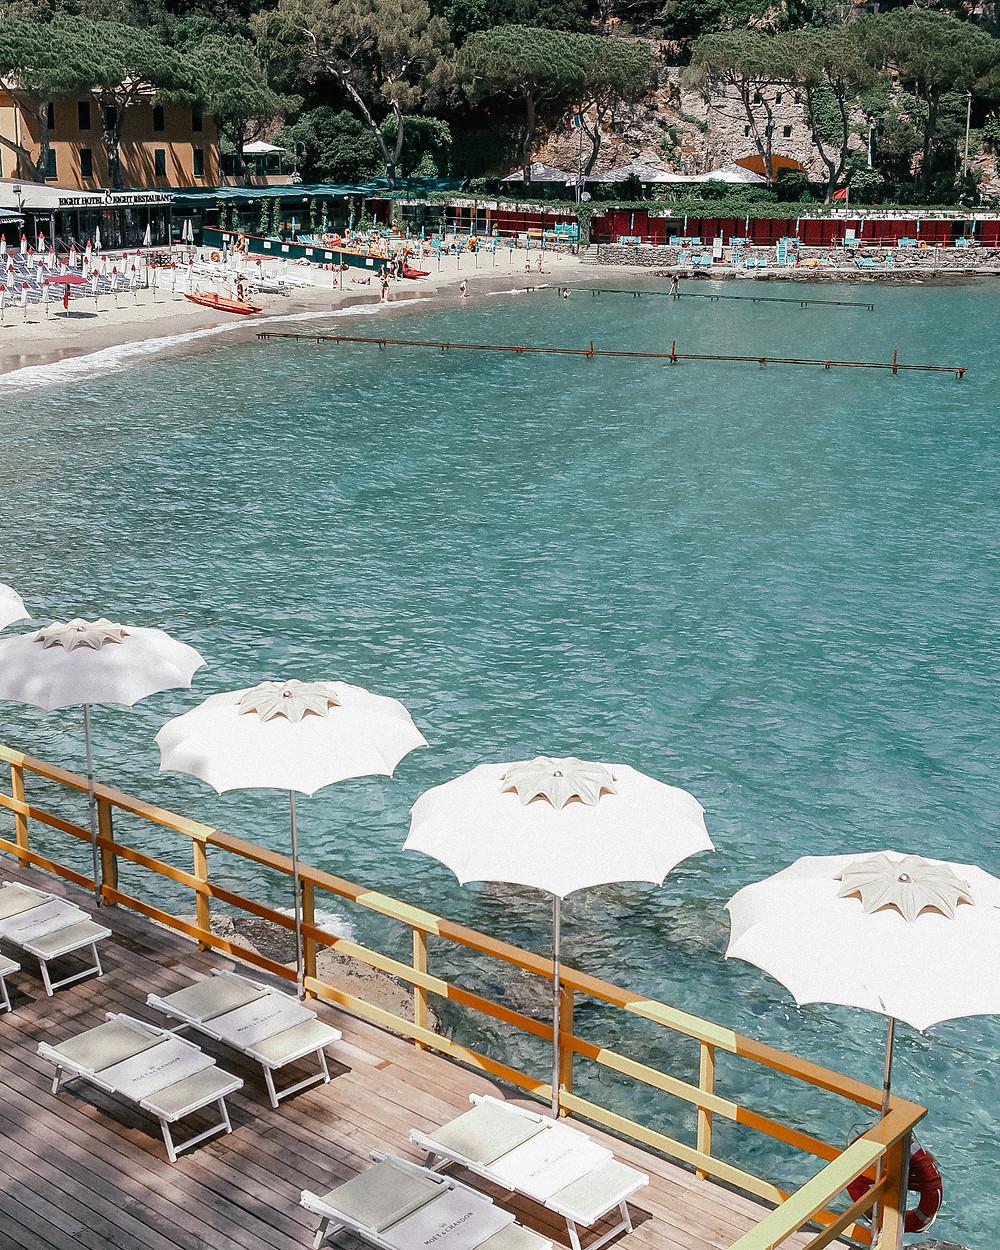 Paraggi Beach, Portofino, Italy